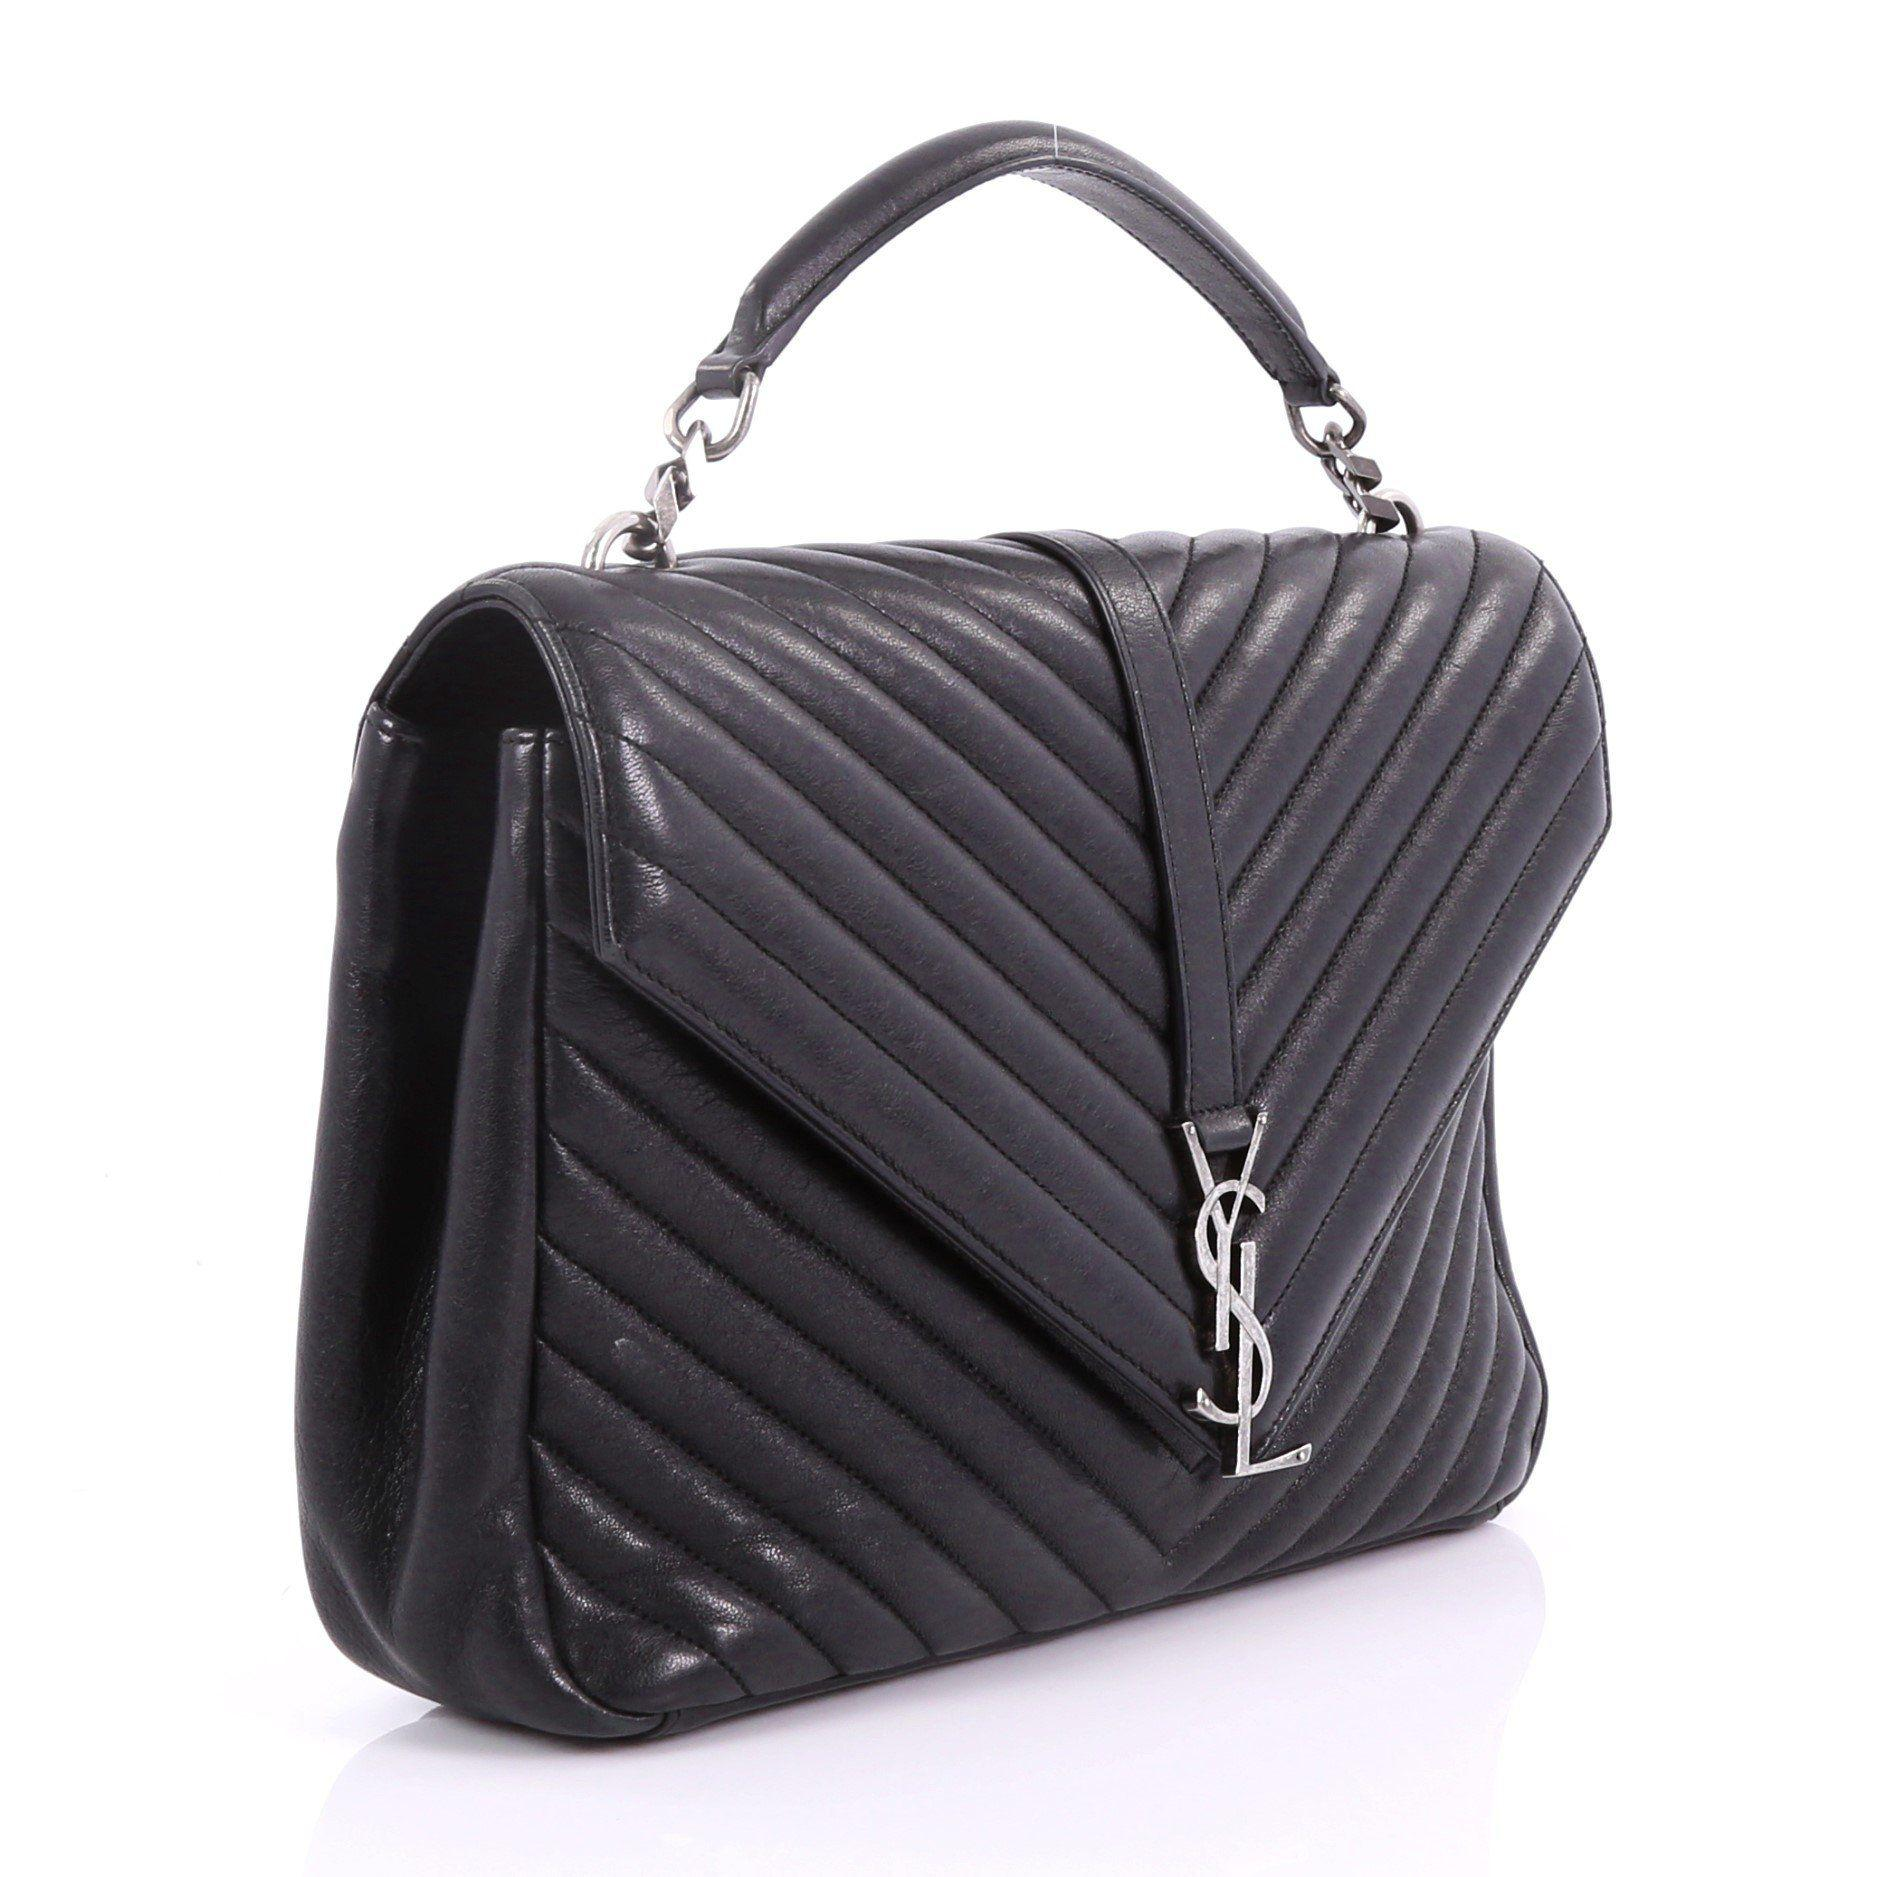 d5e8bfc90ecd Saint Laurent - Black Large Collège Monogram Shoulder Bag - Lyst. View  fullscreen